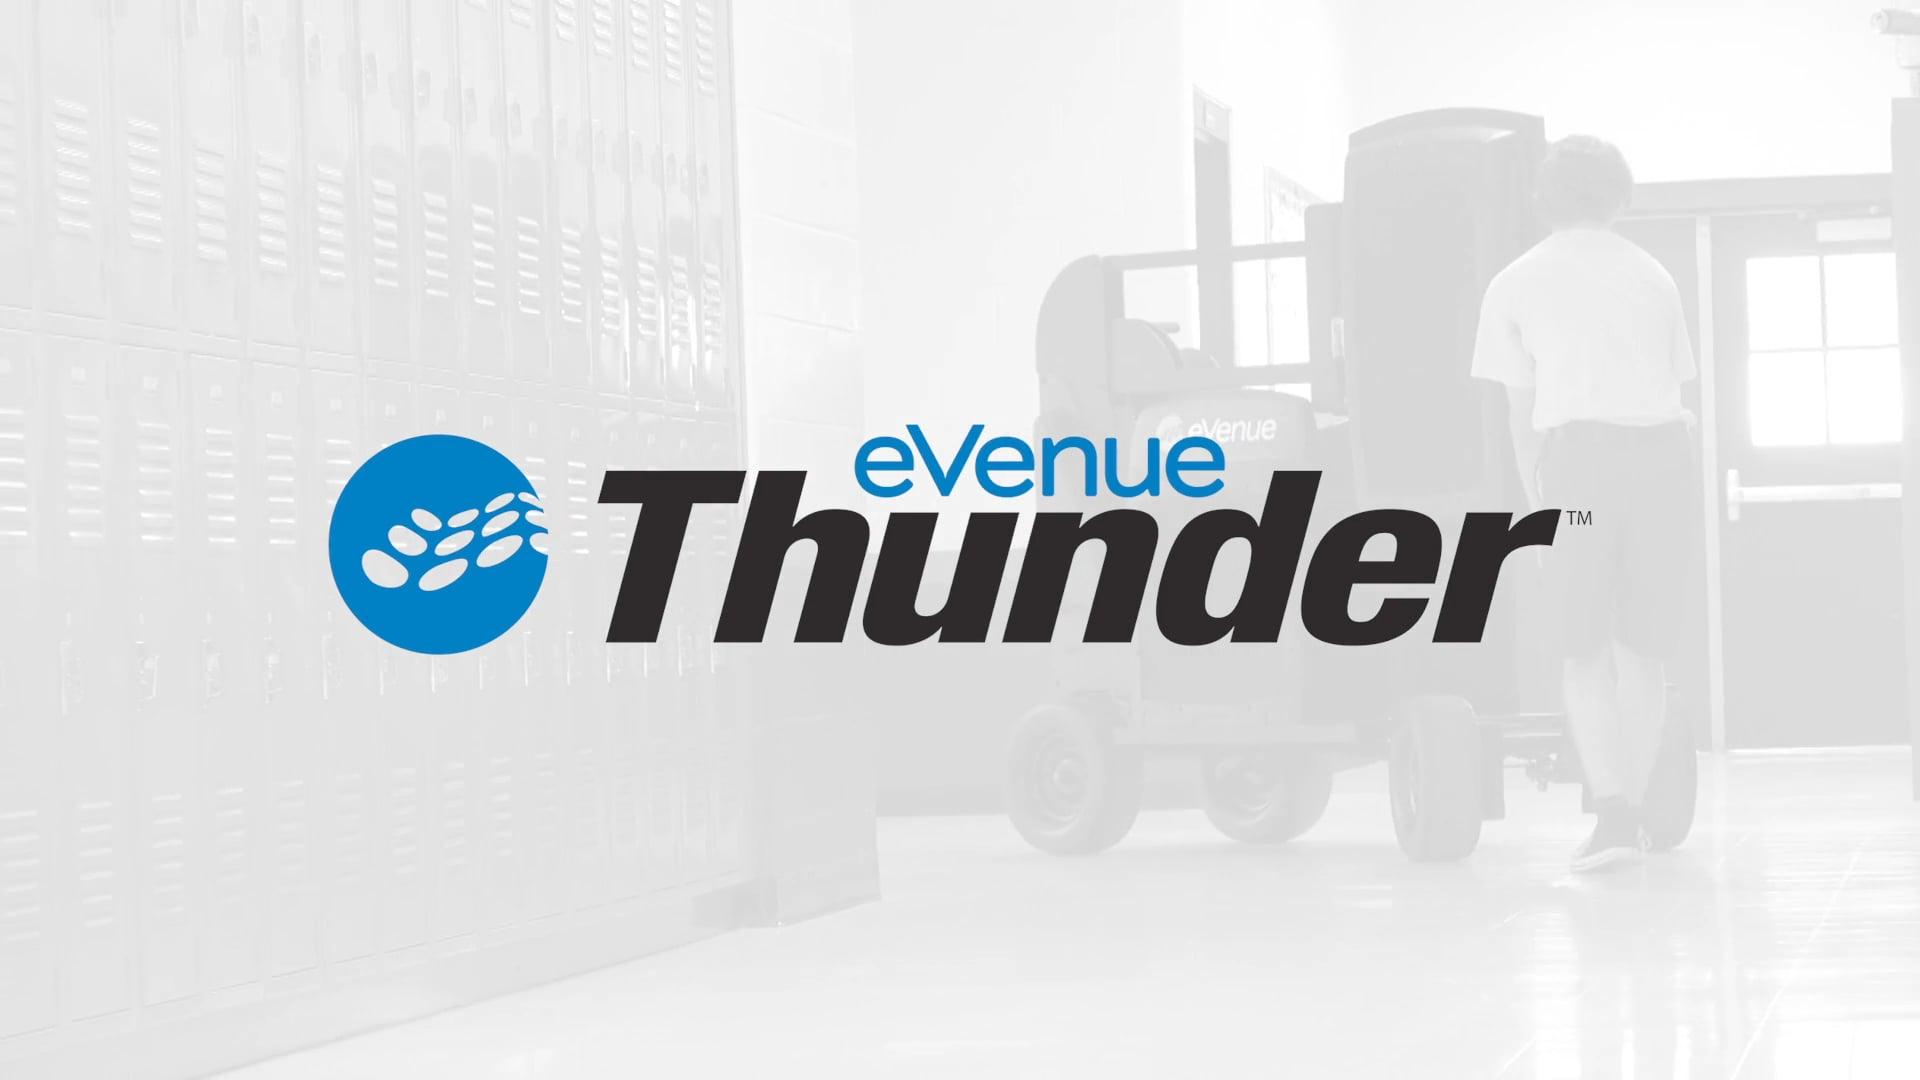 eVenue Thunder - Mobile Audio Anywhere